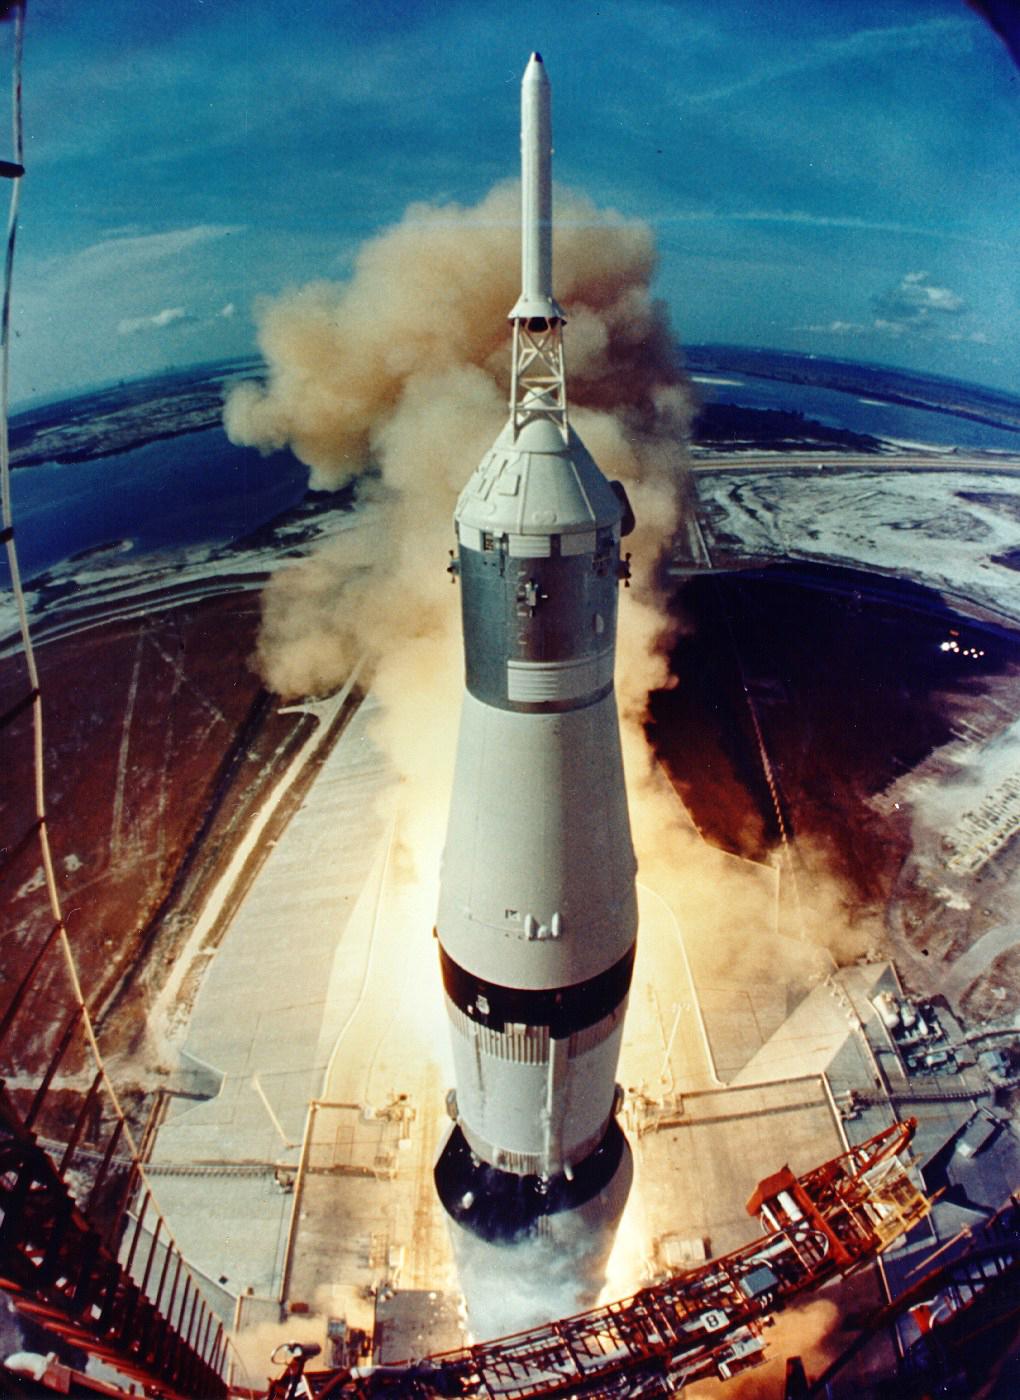 https://i0.wp.com/www.nasa.gov/images/content/139726main_Apollo_11_hires.jpg